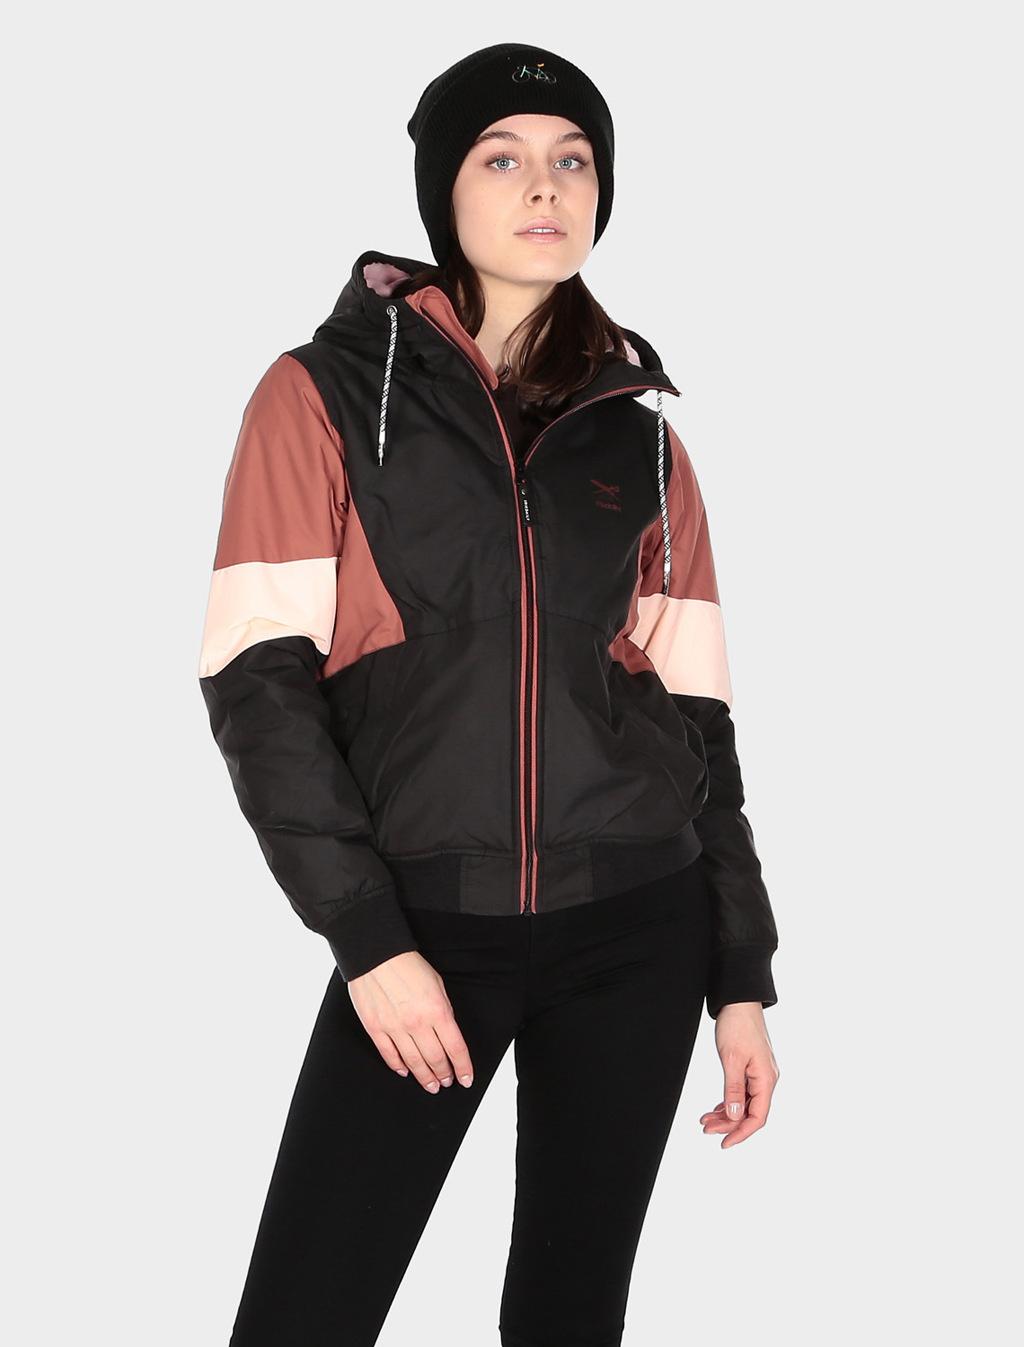 Blotchy Jacket - Black rose-4